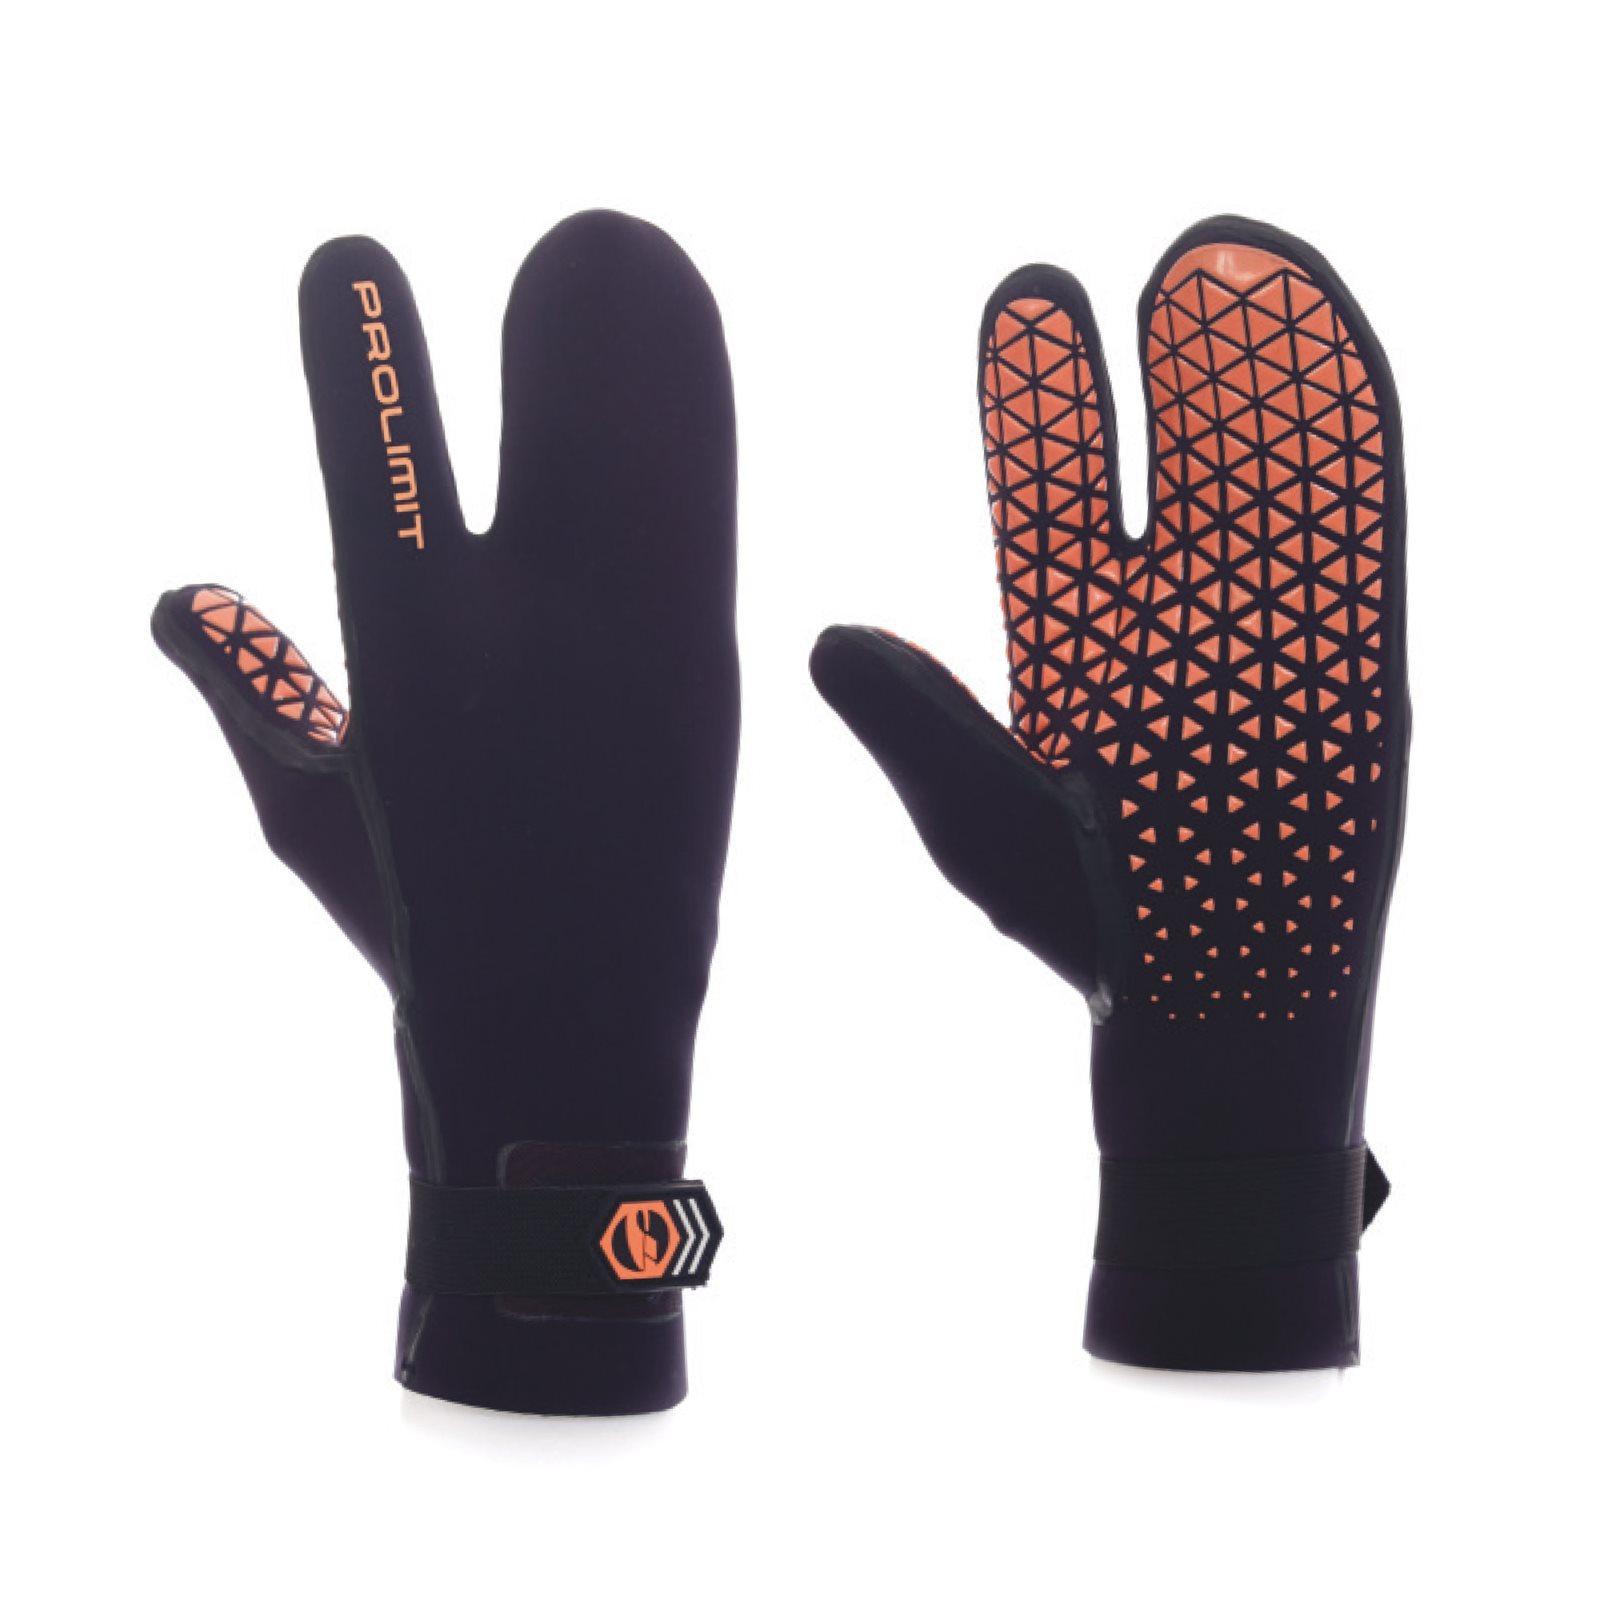 rukavice Prolimit 2mm Hydrogen Mitten - M